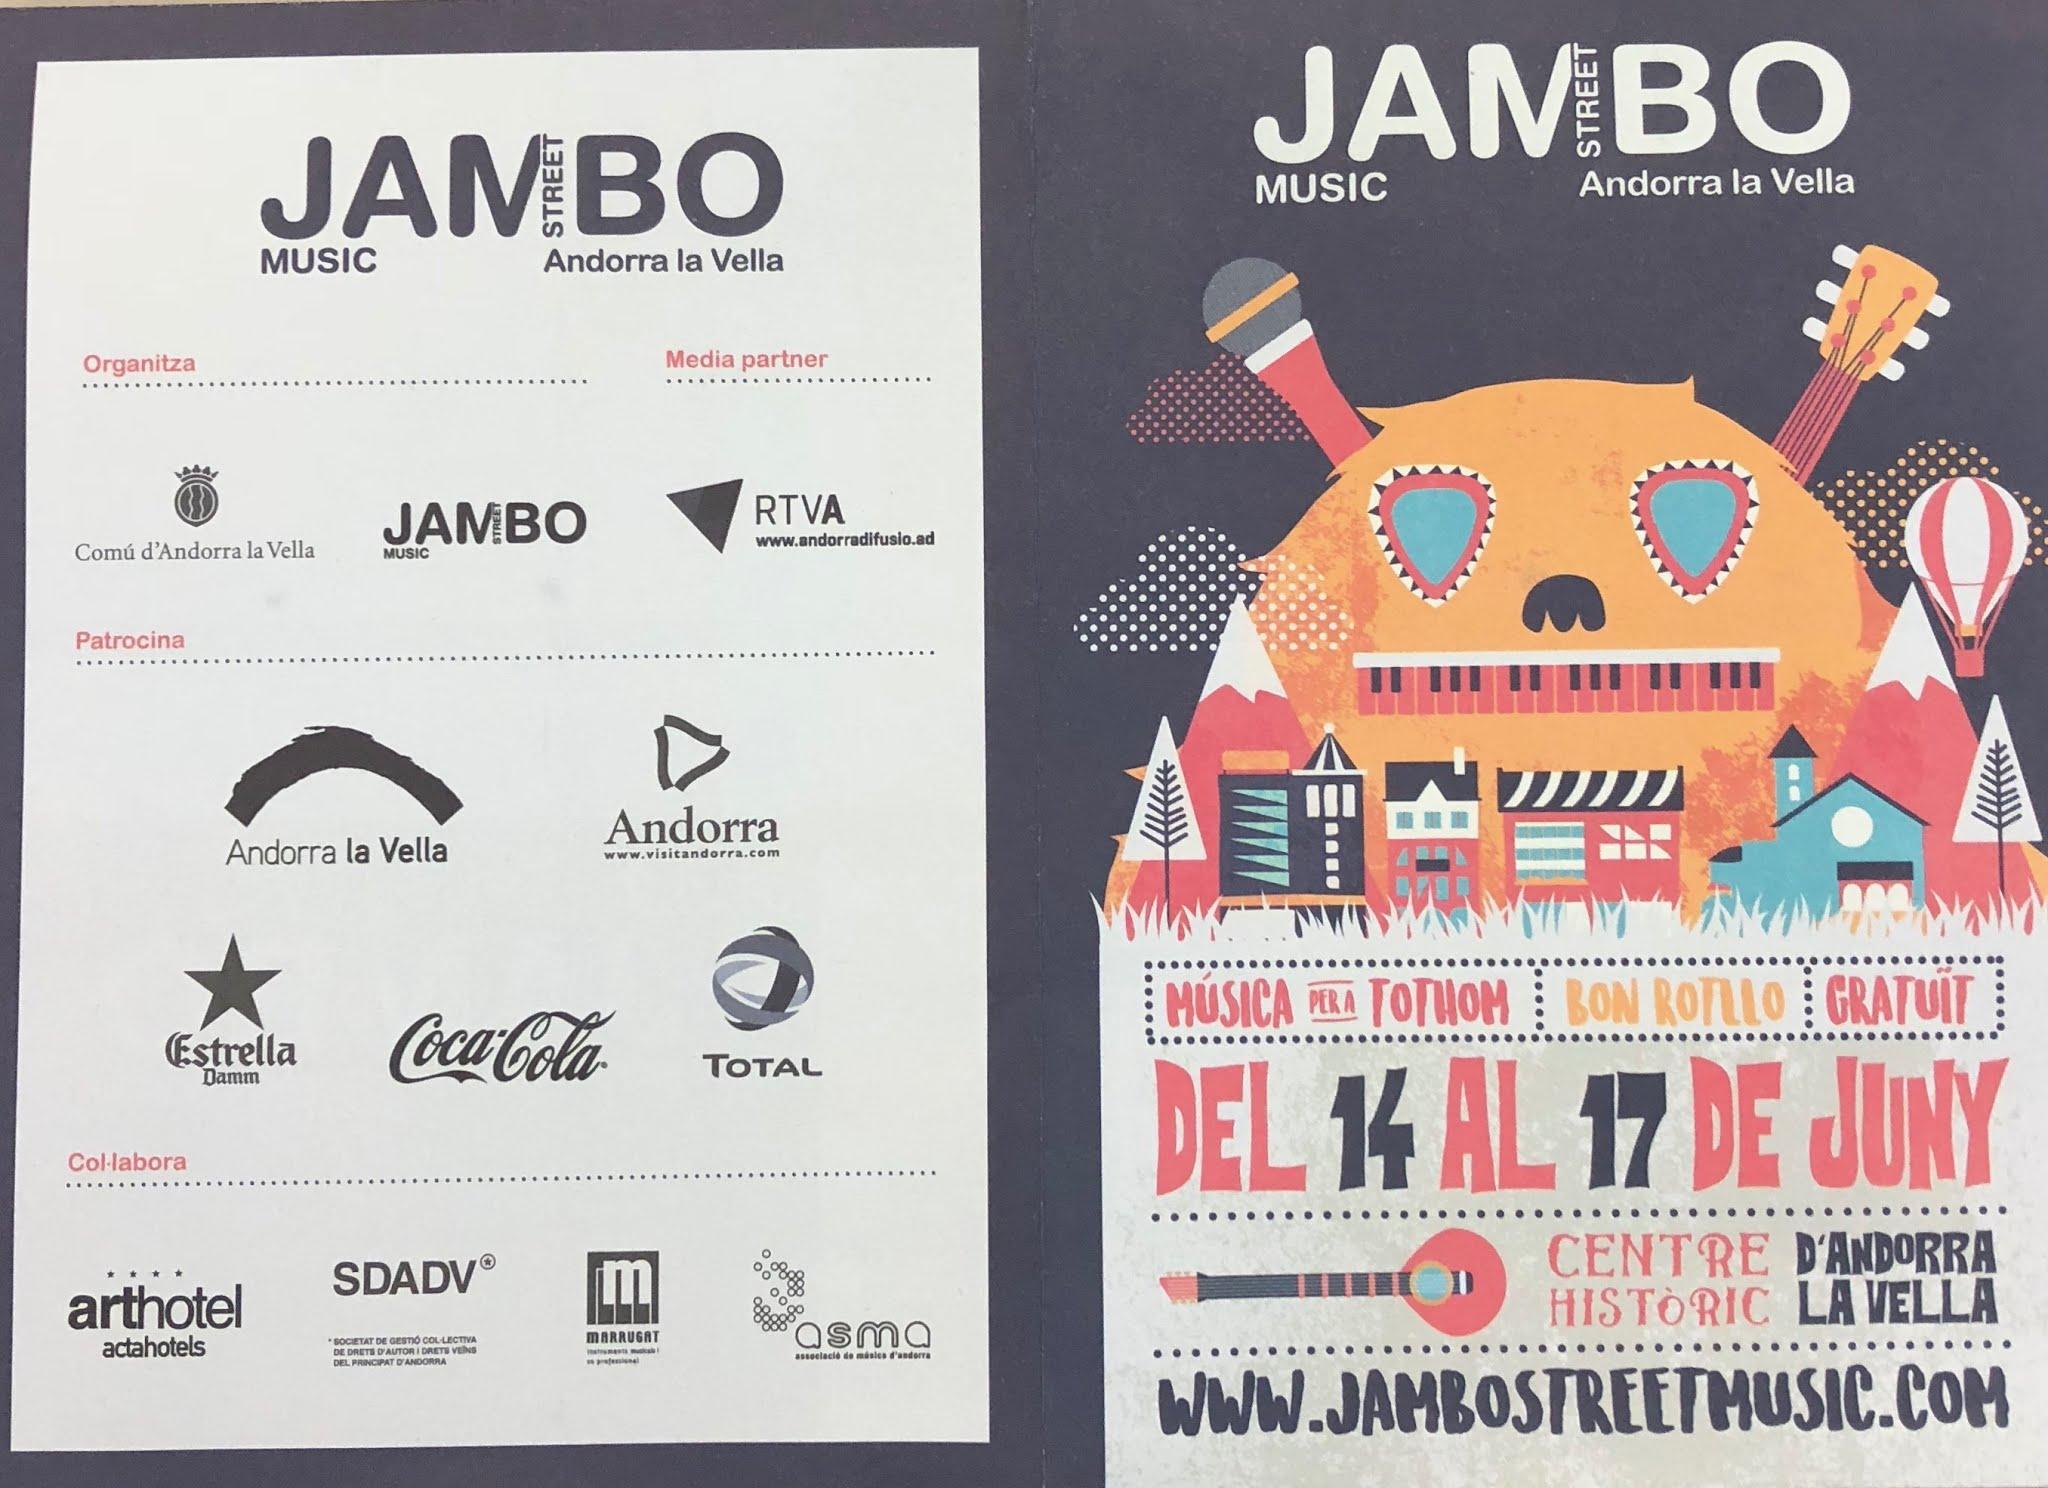 Tot a punt pel Jambo